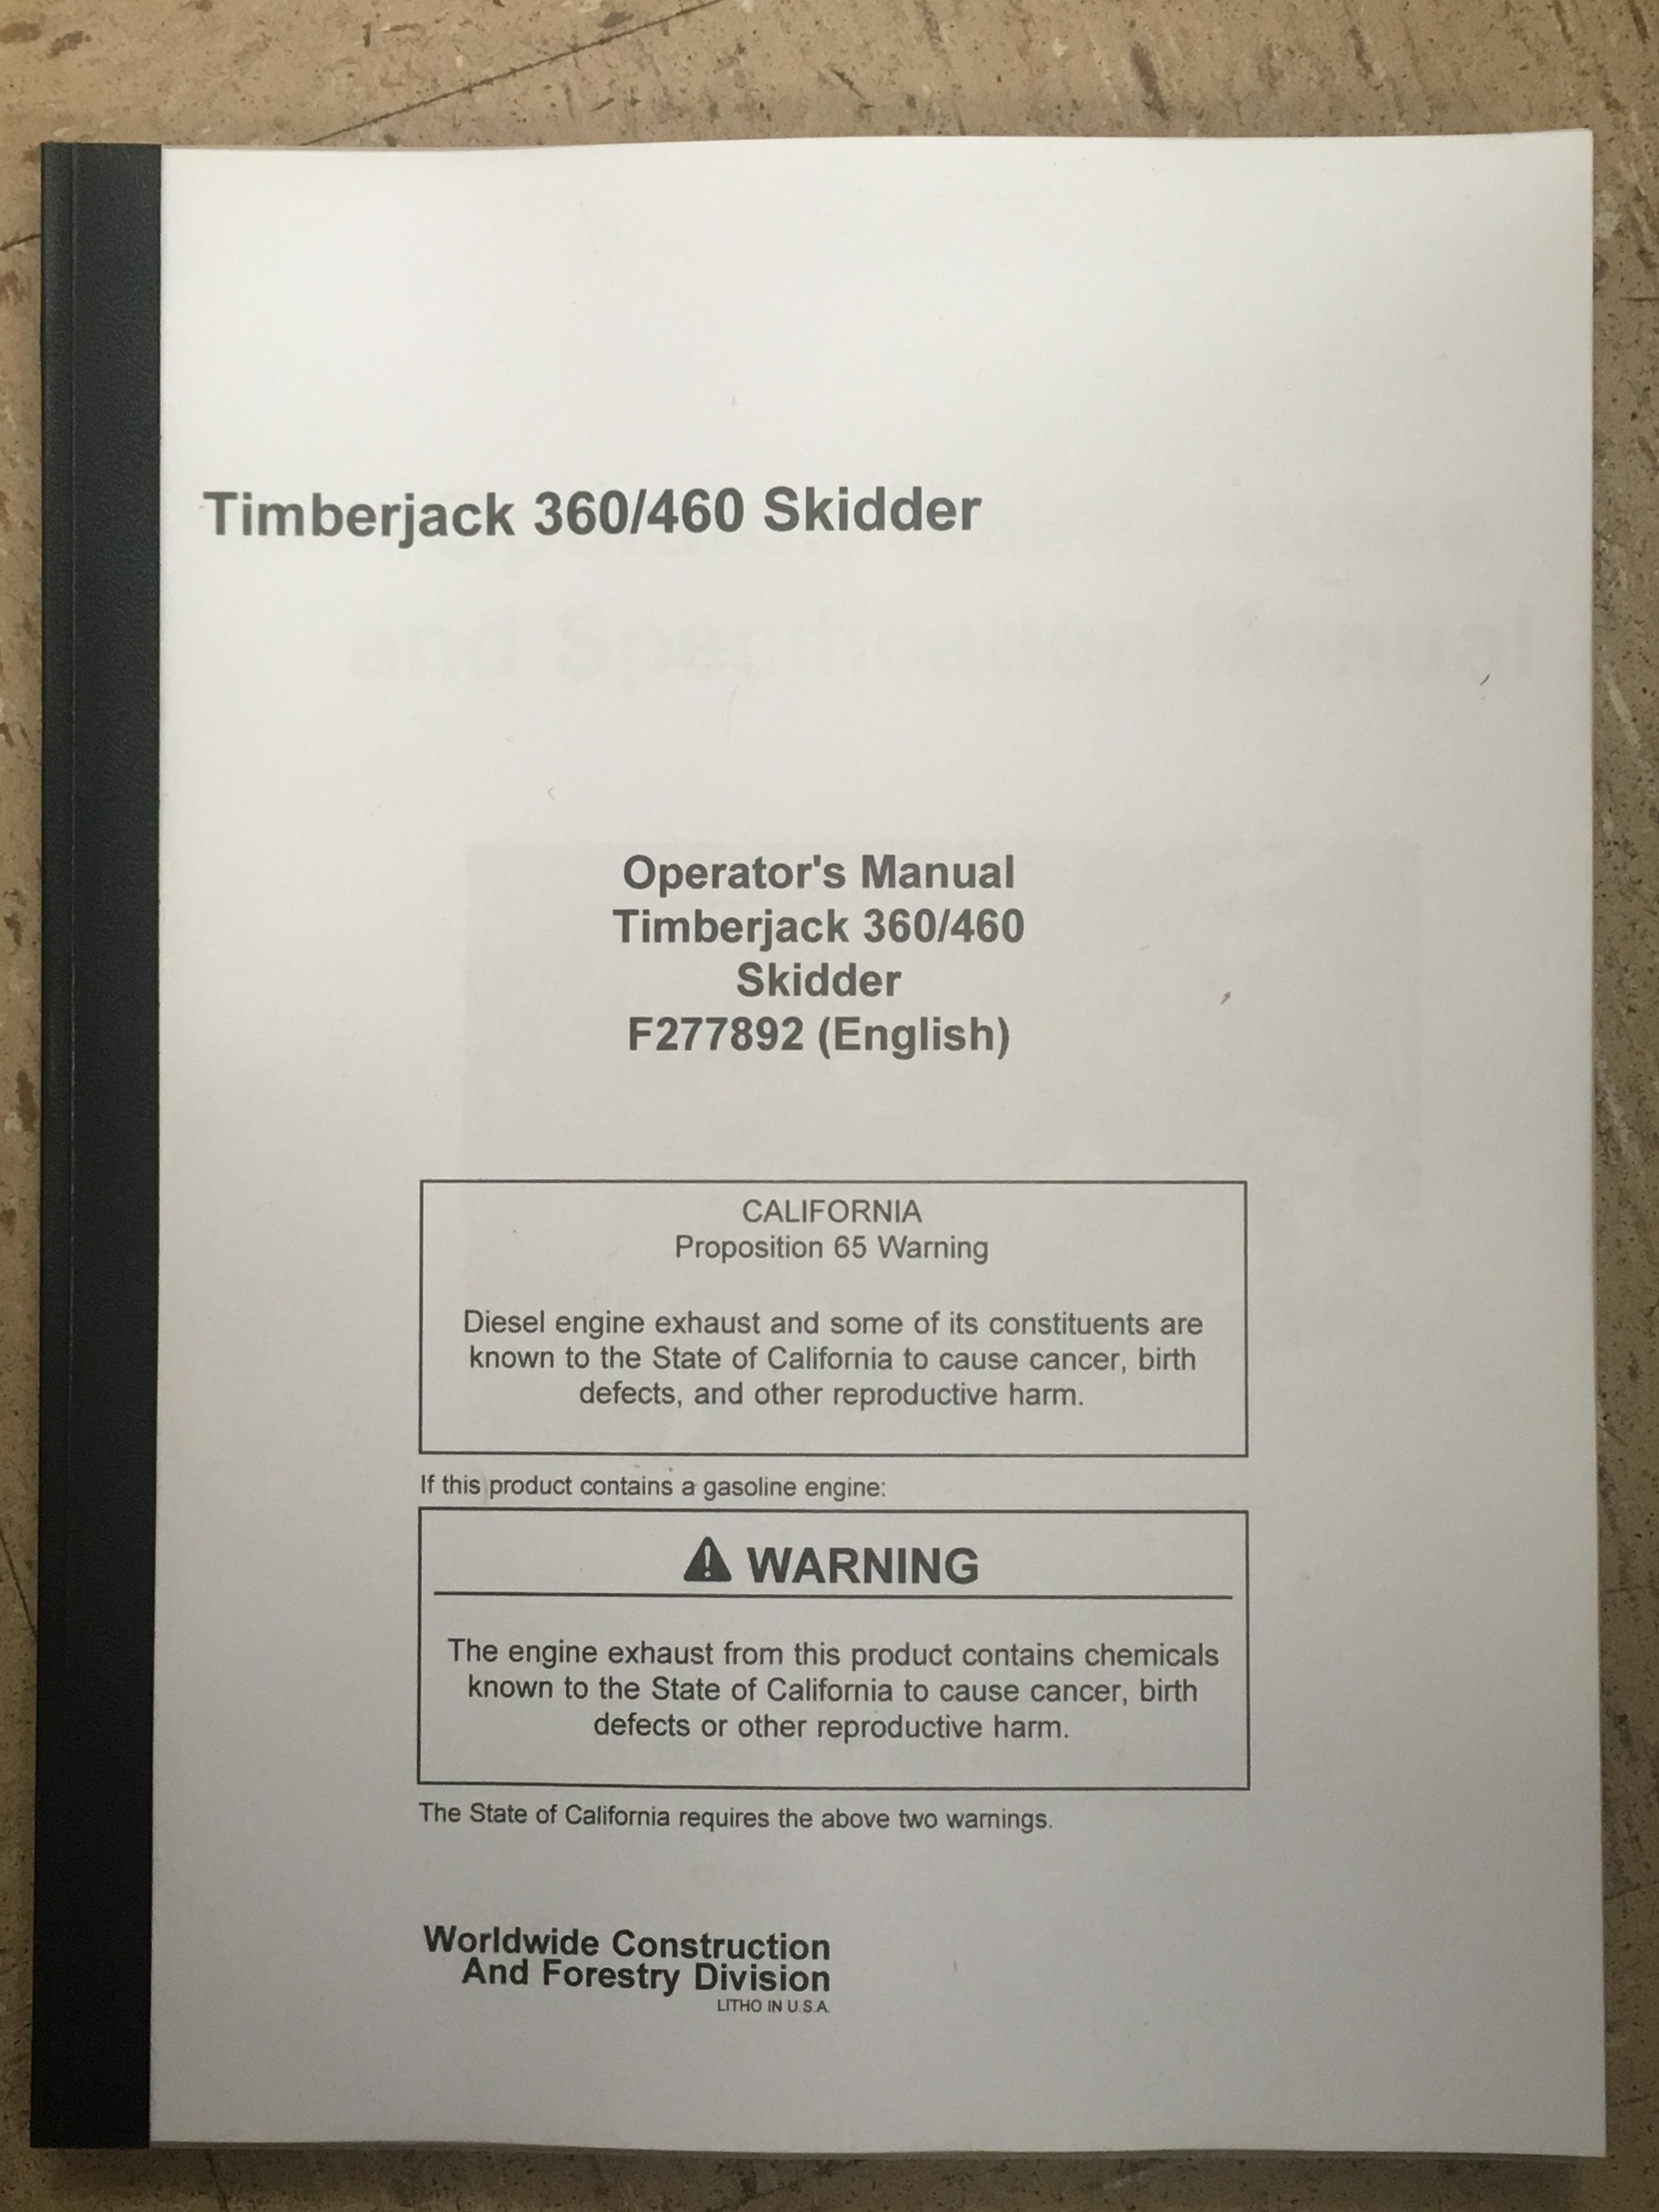 John Deere Timberjack 360 460 Skidder Operators Manual JD F277892 Book |  Finney Equipment and Parts